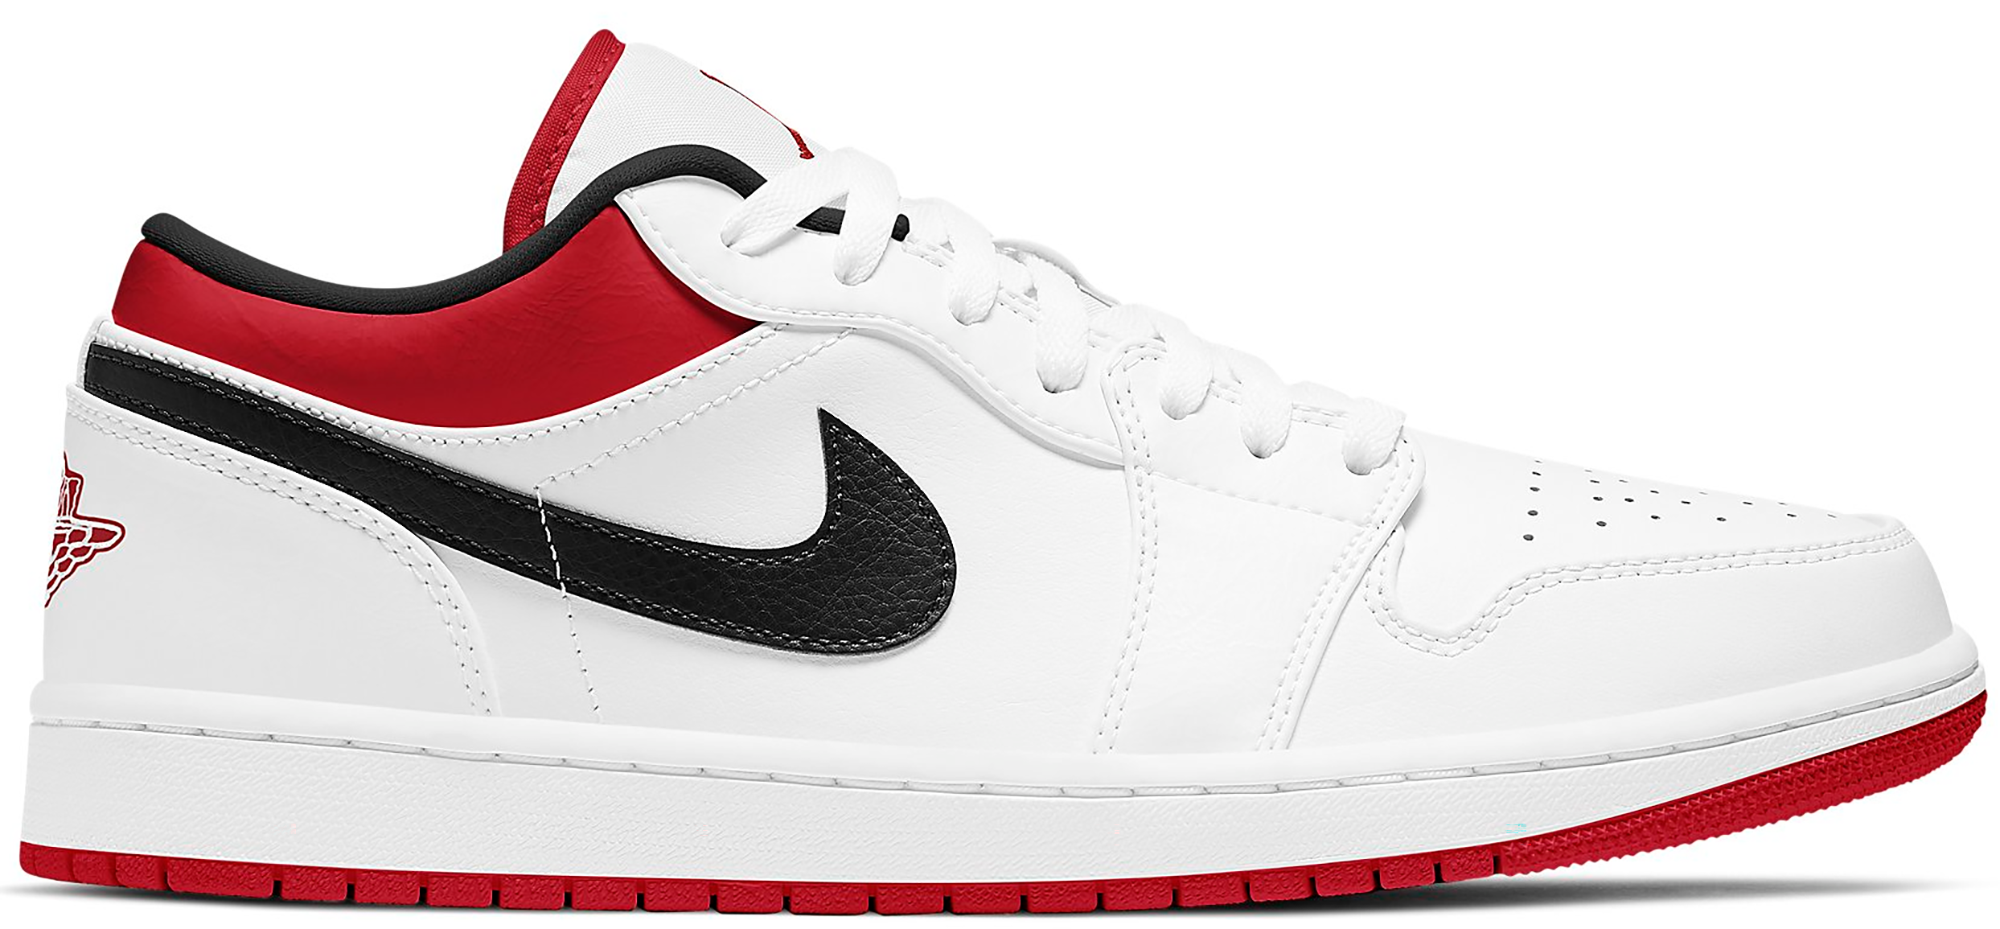 Jordan 1 Low White University Red Black